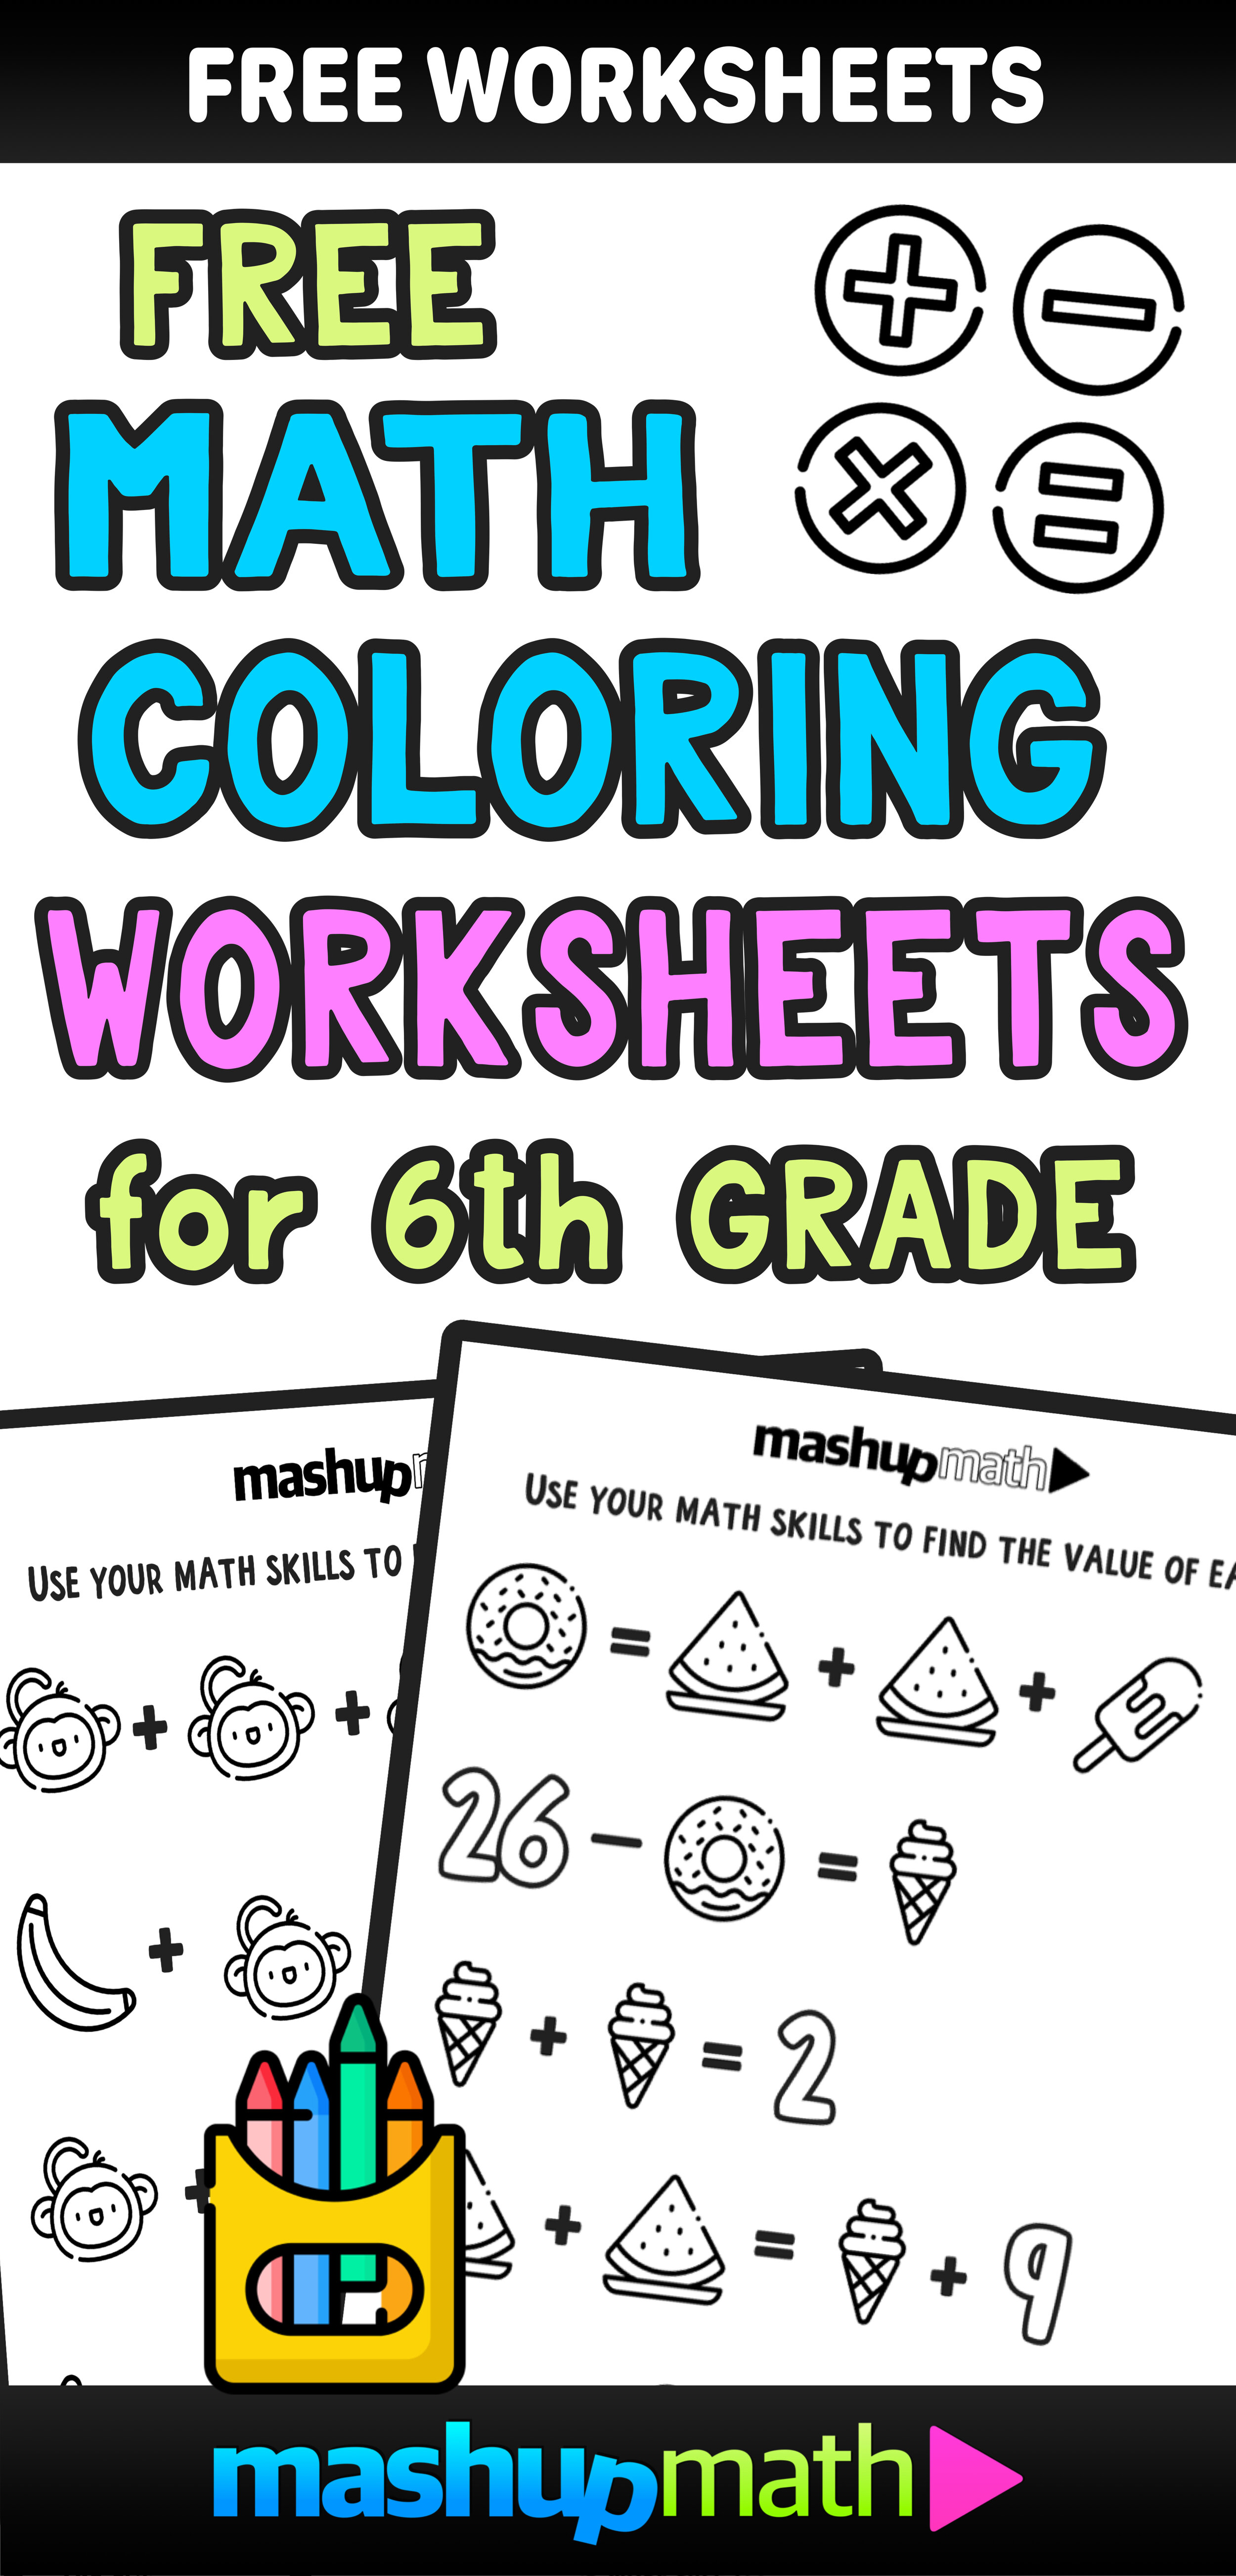 Free Math Coloring Worksheets For 5th And 6th Grade — Mashup Math